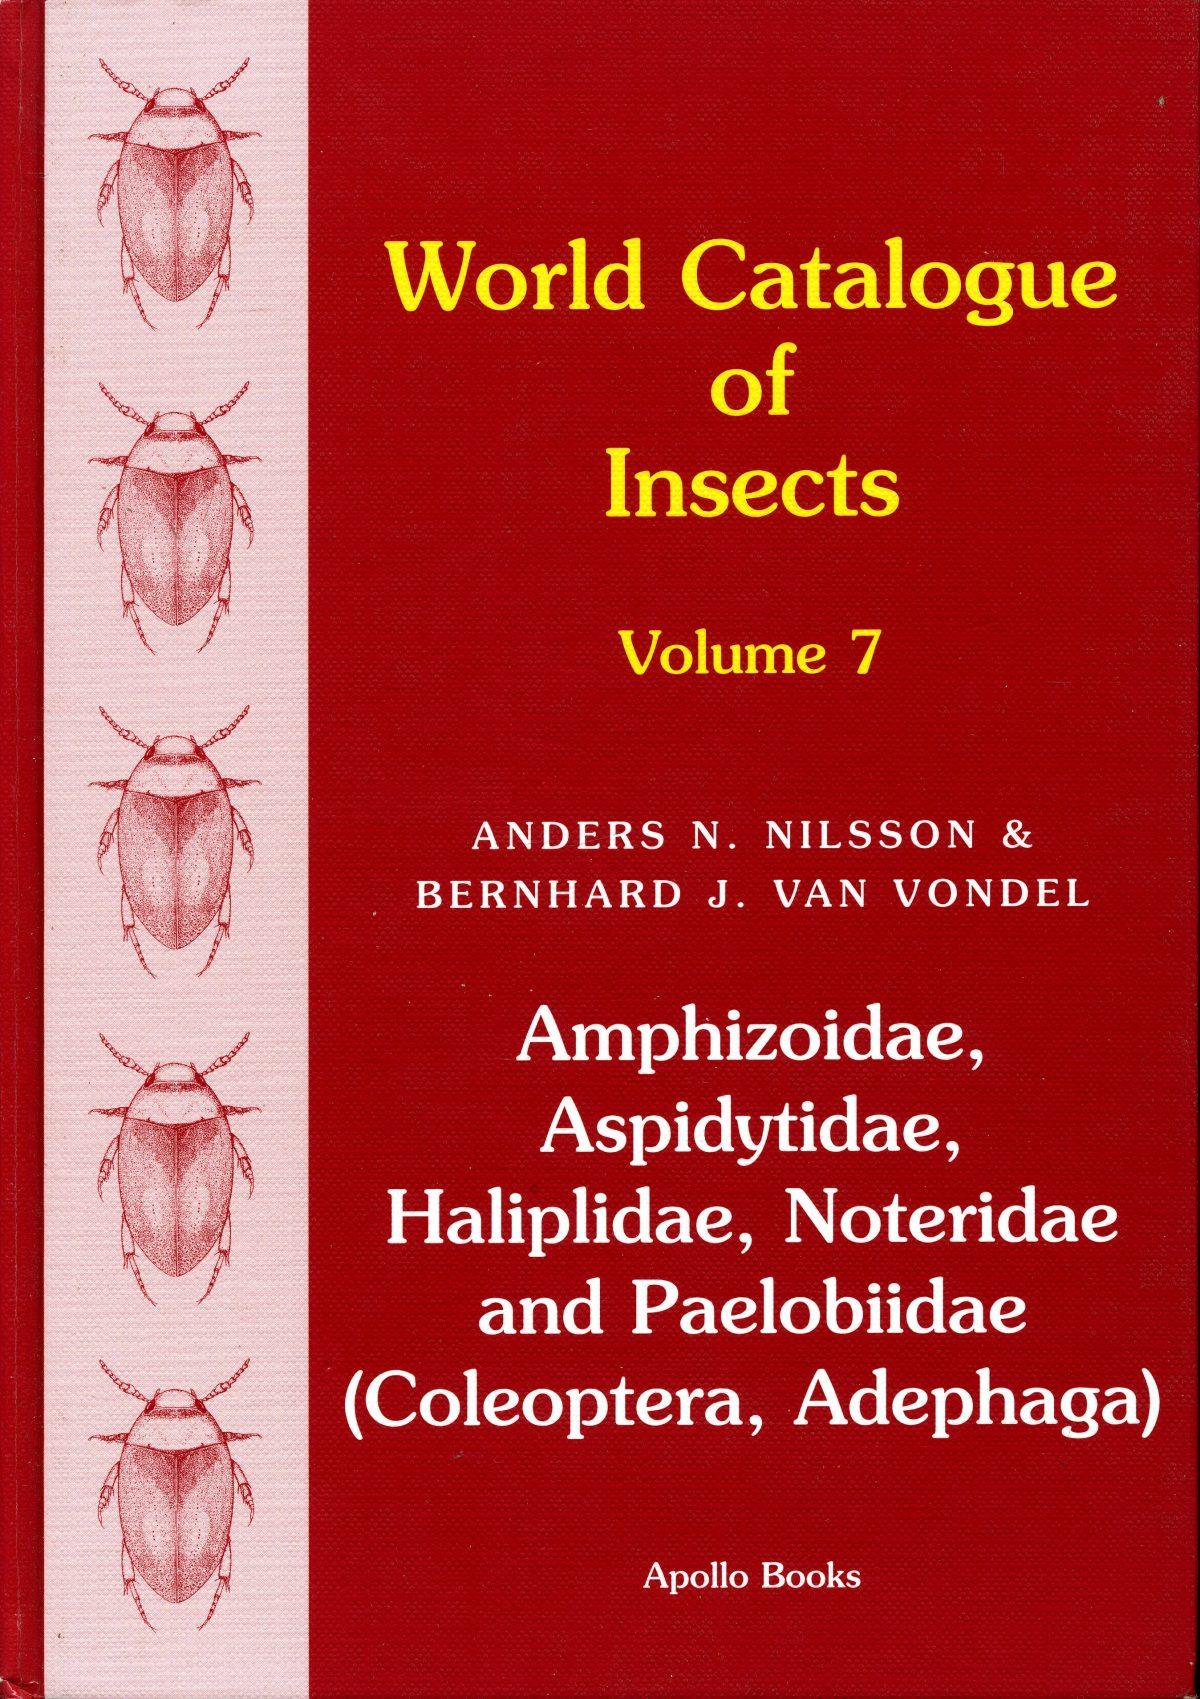 """Amphizoidae, Aspidytidae, Haliplidae, Noteridae and Paelobiidae (Coleoptera, Adephaga)"""